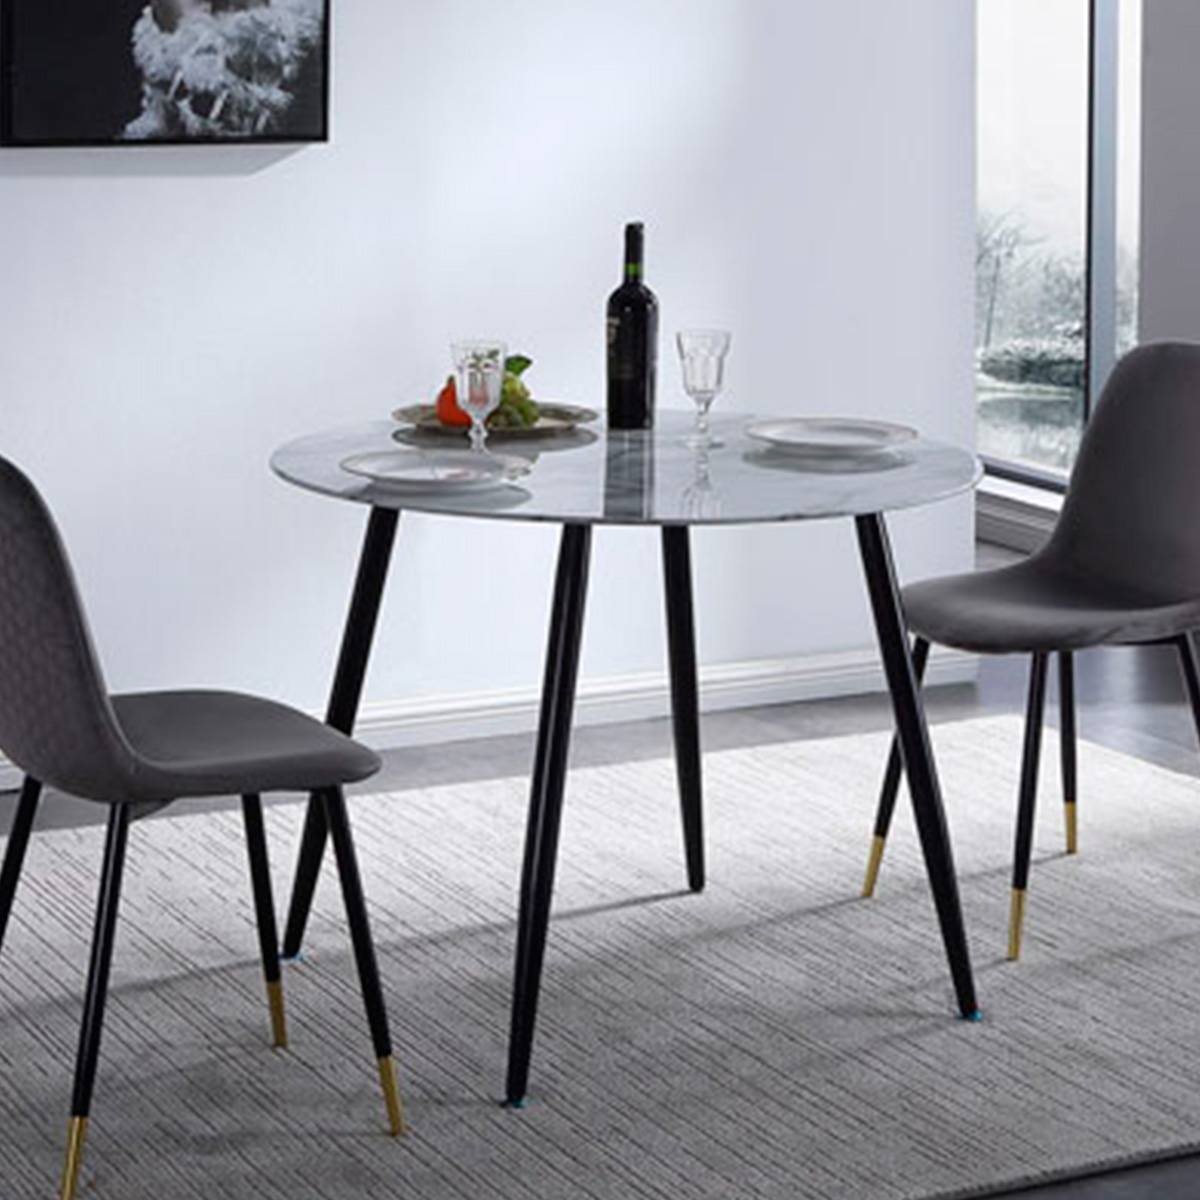 Mesa redonda comedor cristal efecto marmol 120cm patas negro ...